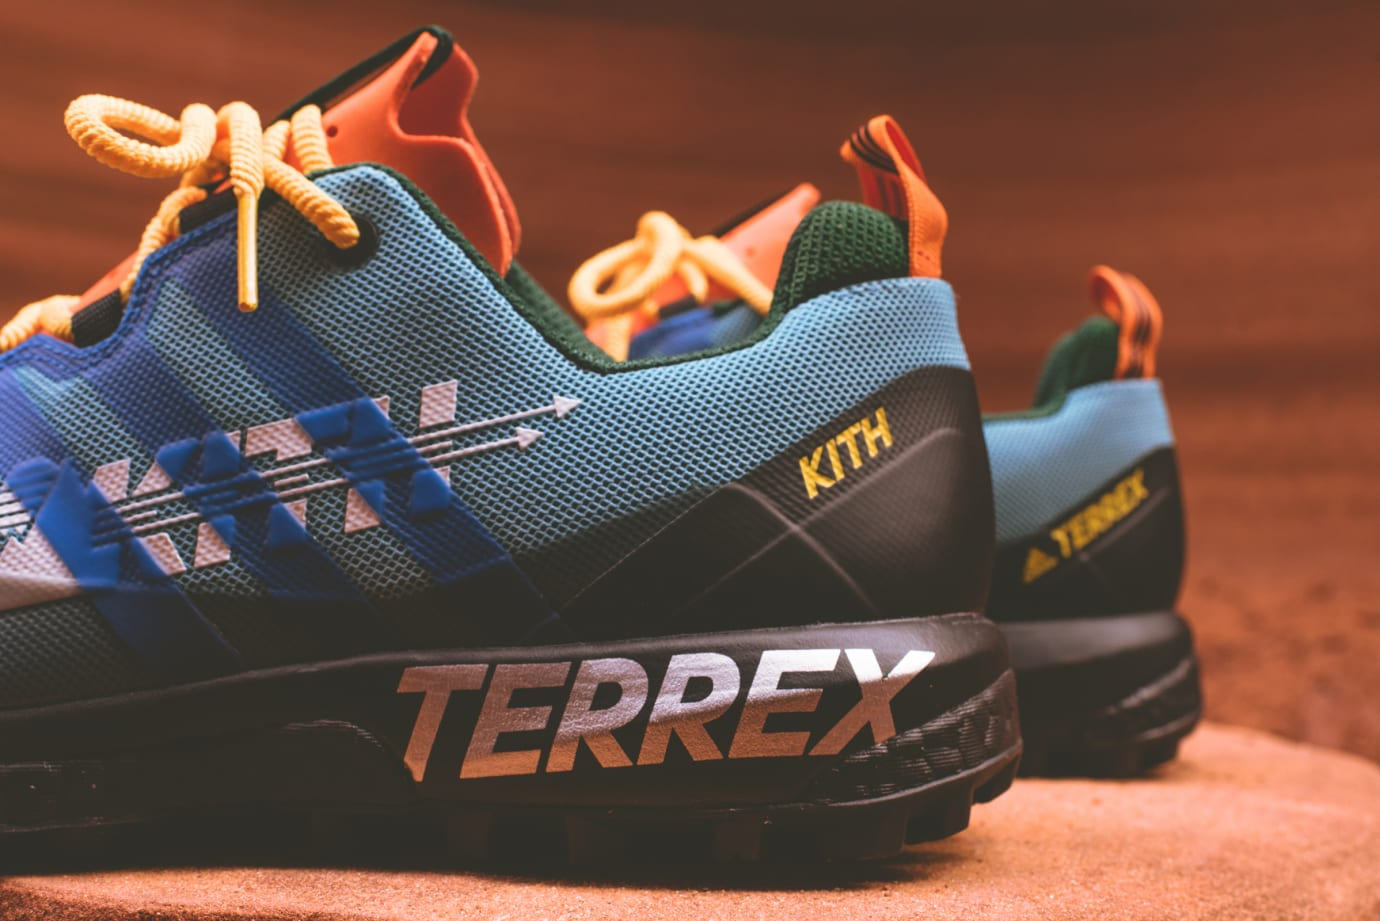 Stevenson barajar hielo  Kith x Adidas Terrex 'EEA' Collection Release Date   Sole Collector